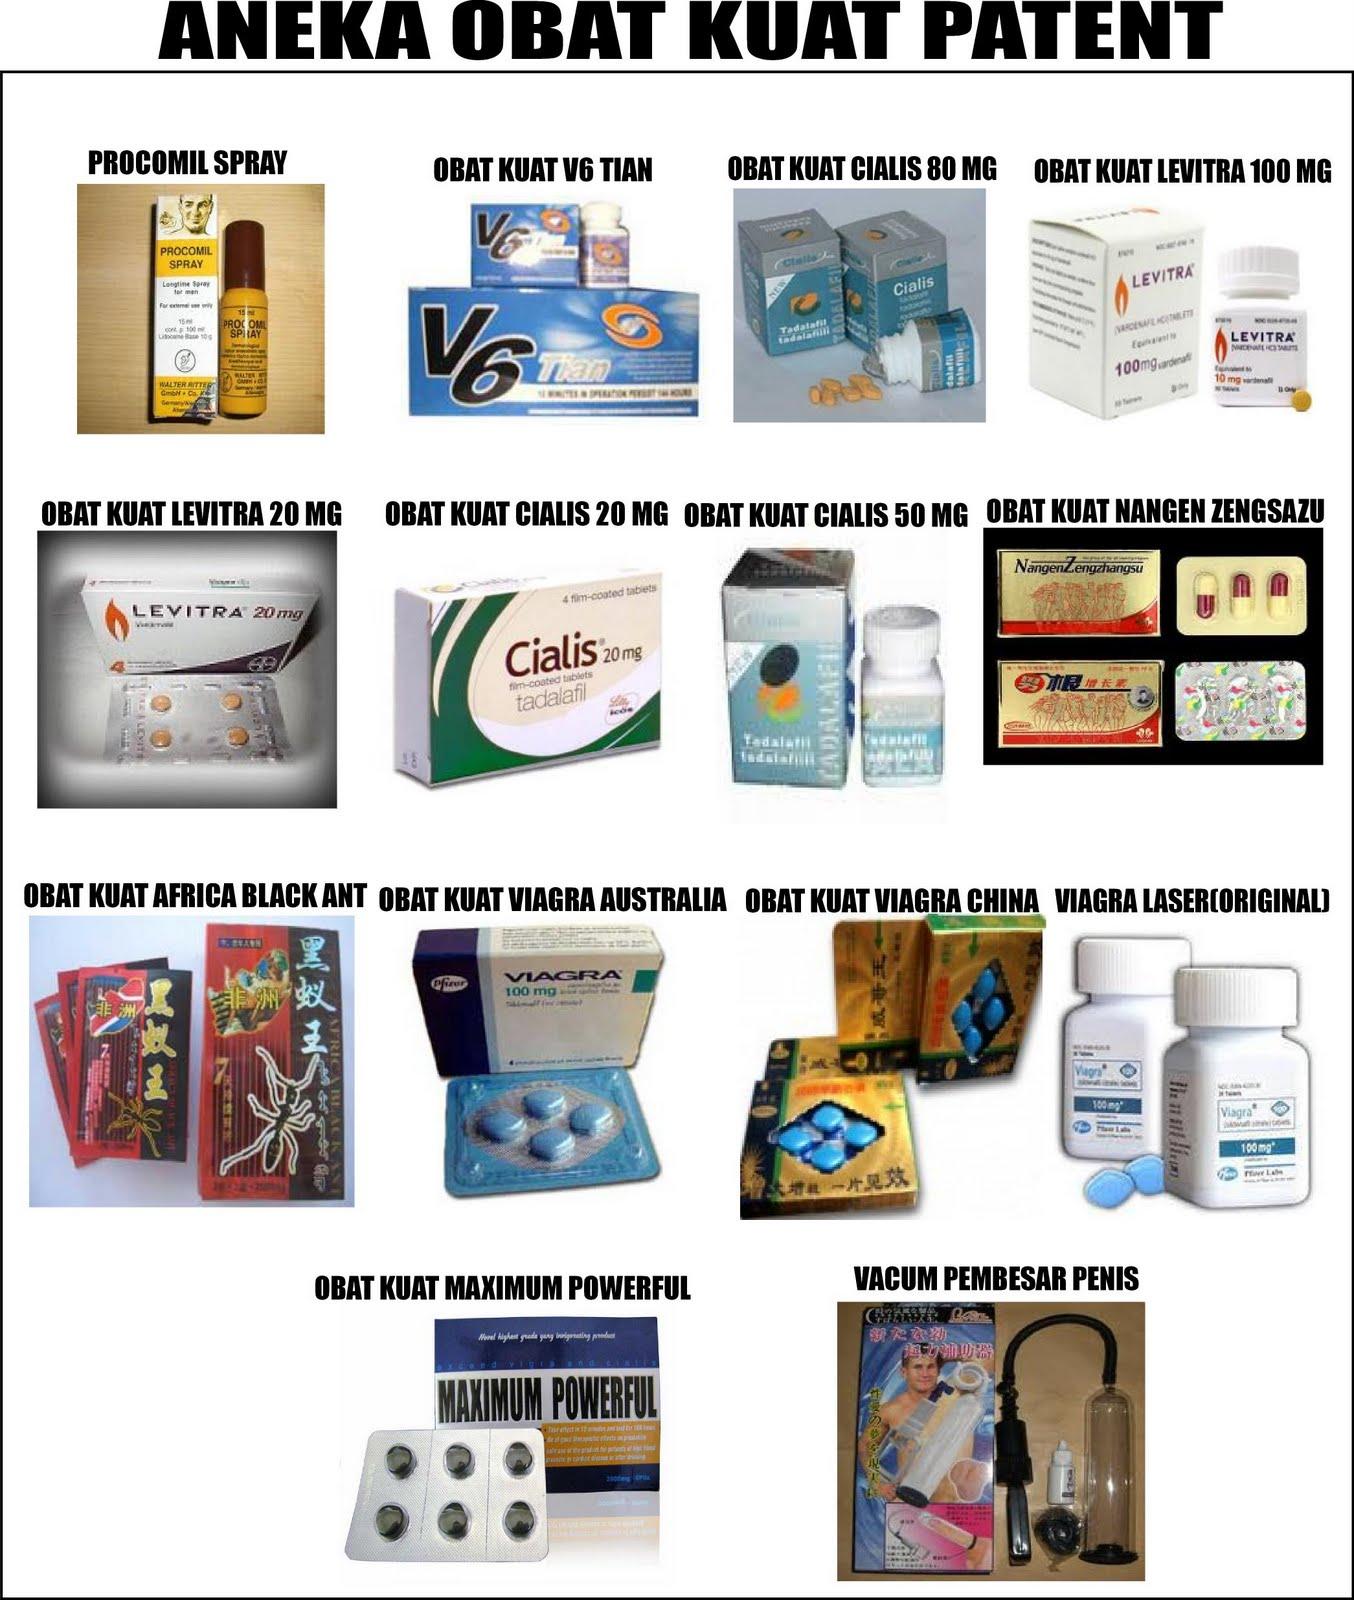 obat kuat perkasa central obat online